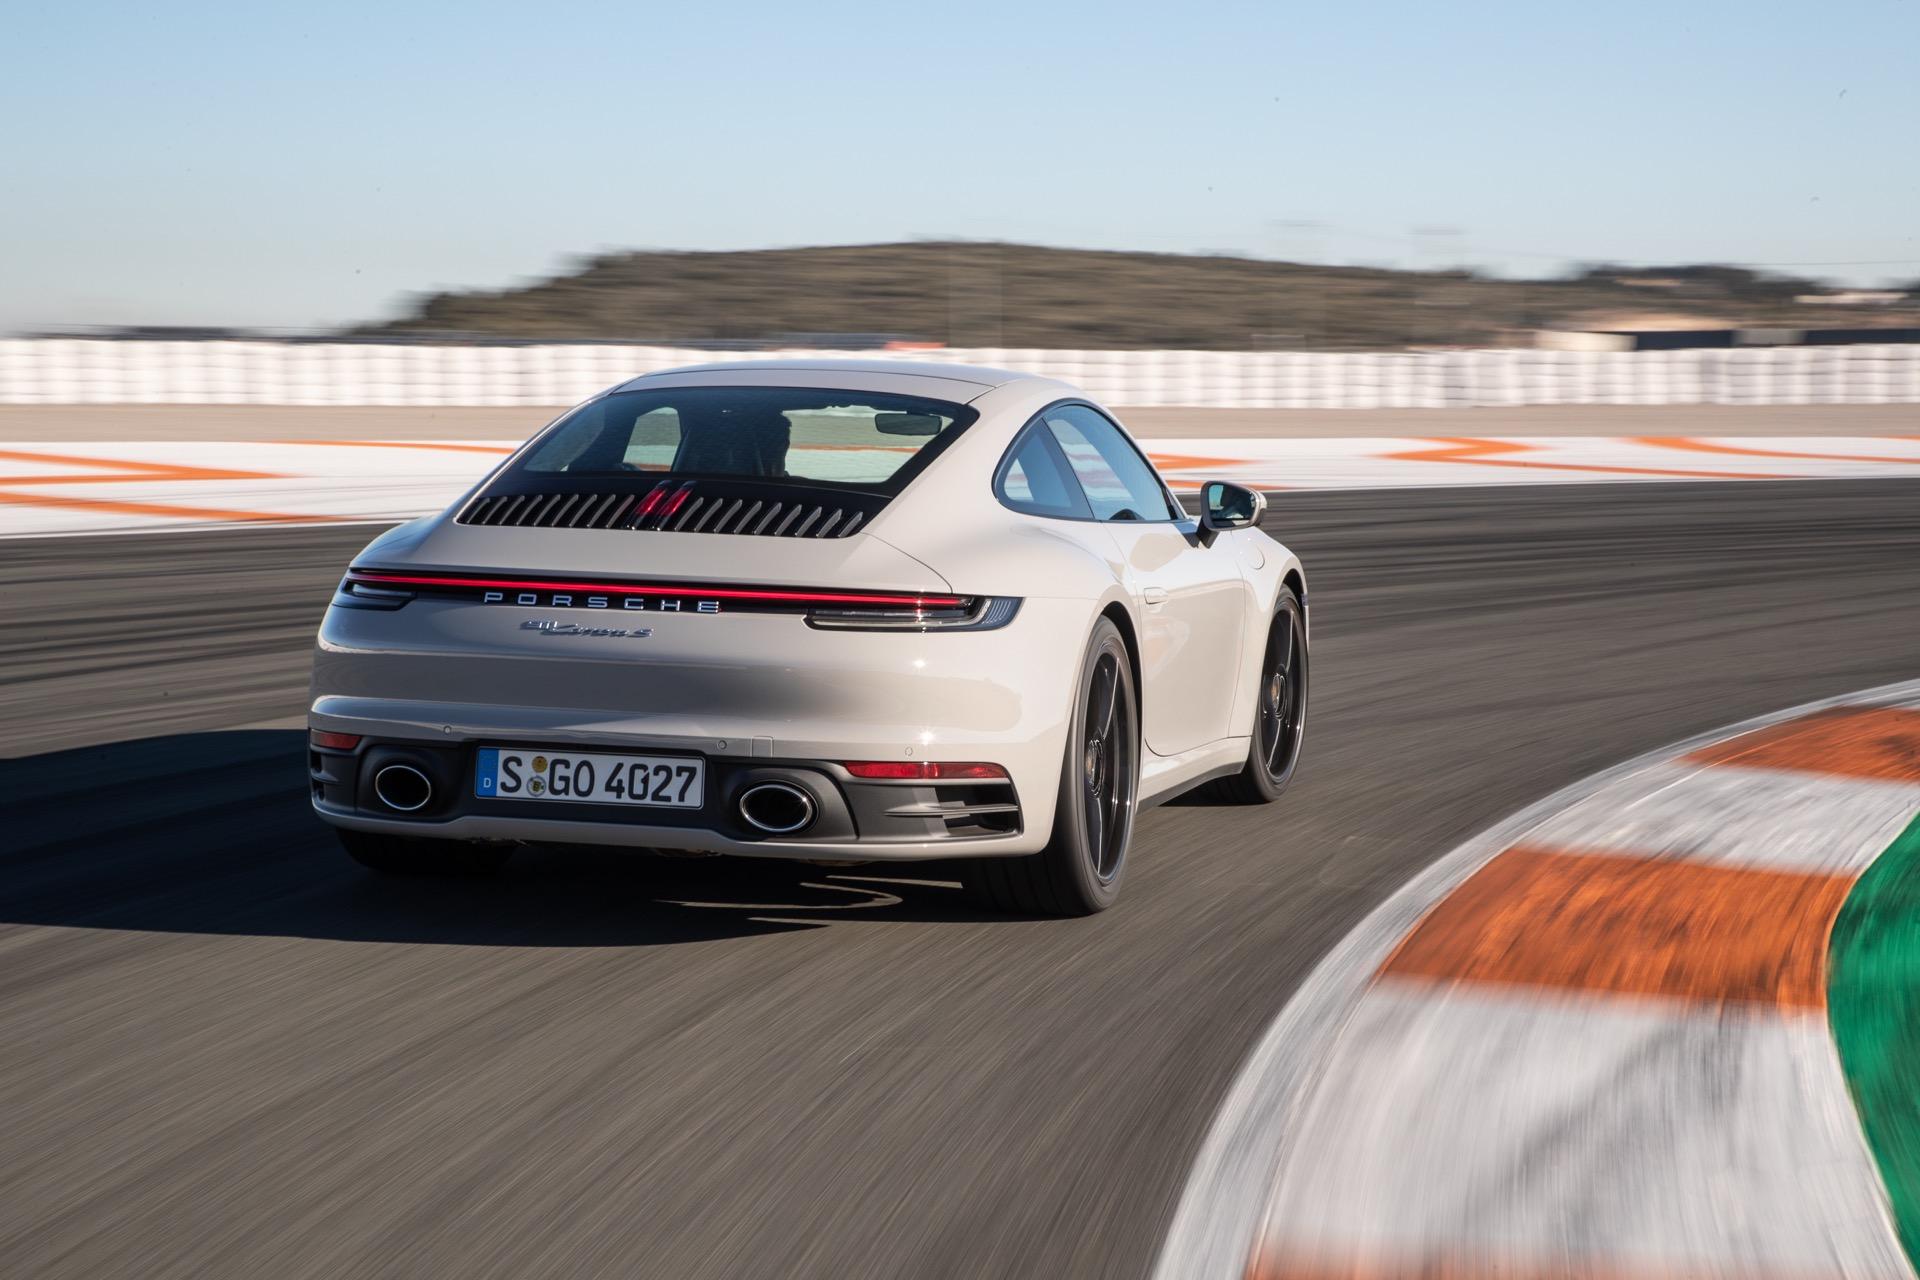 Porsche 911 992 Carrera S 00005